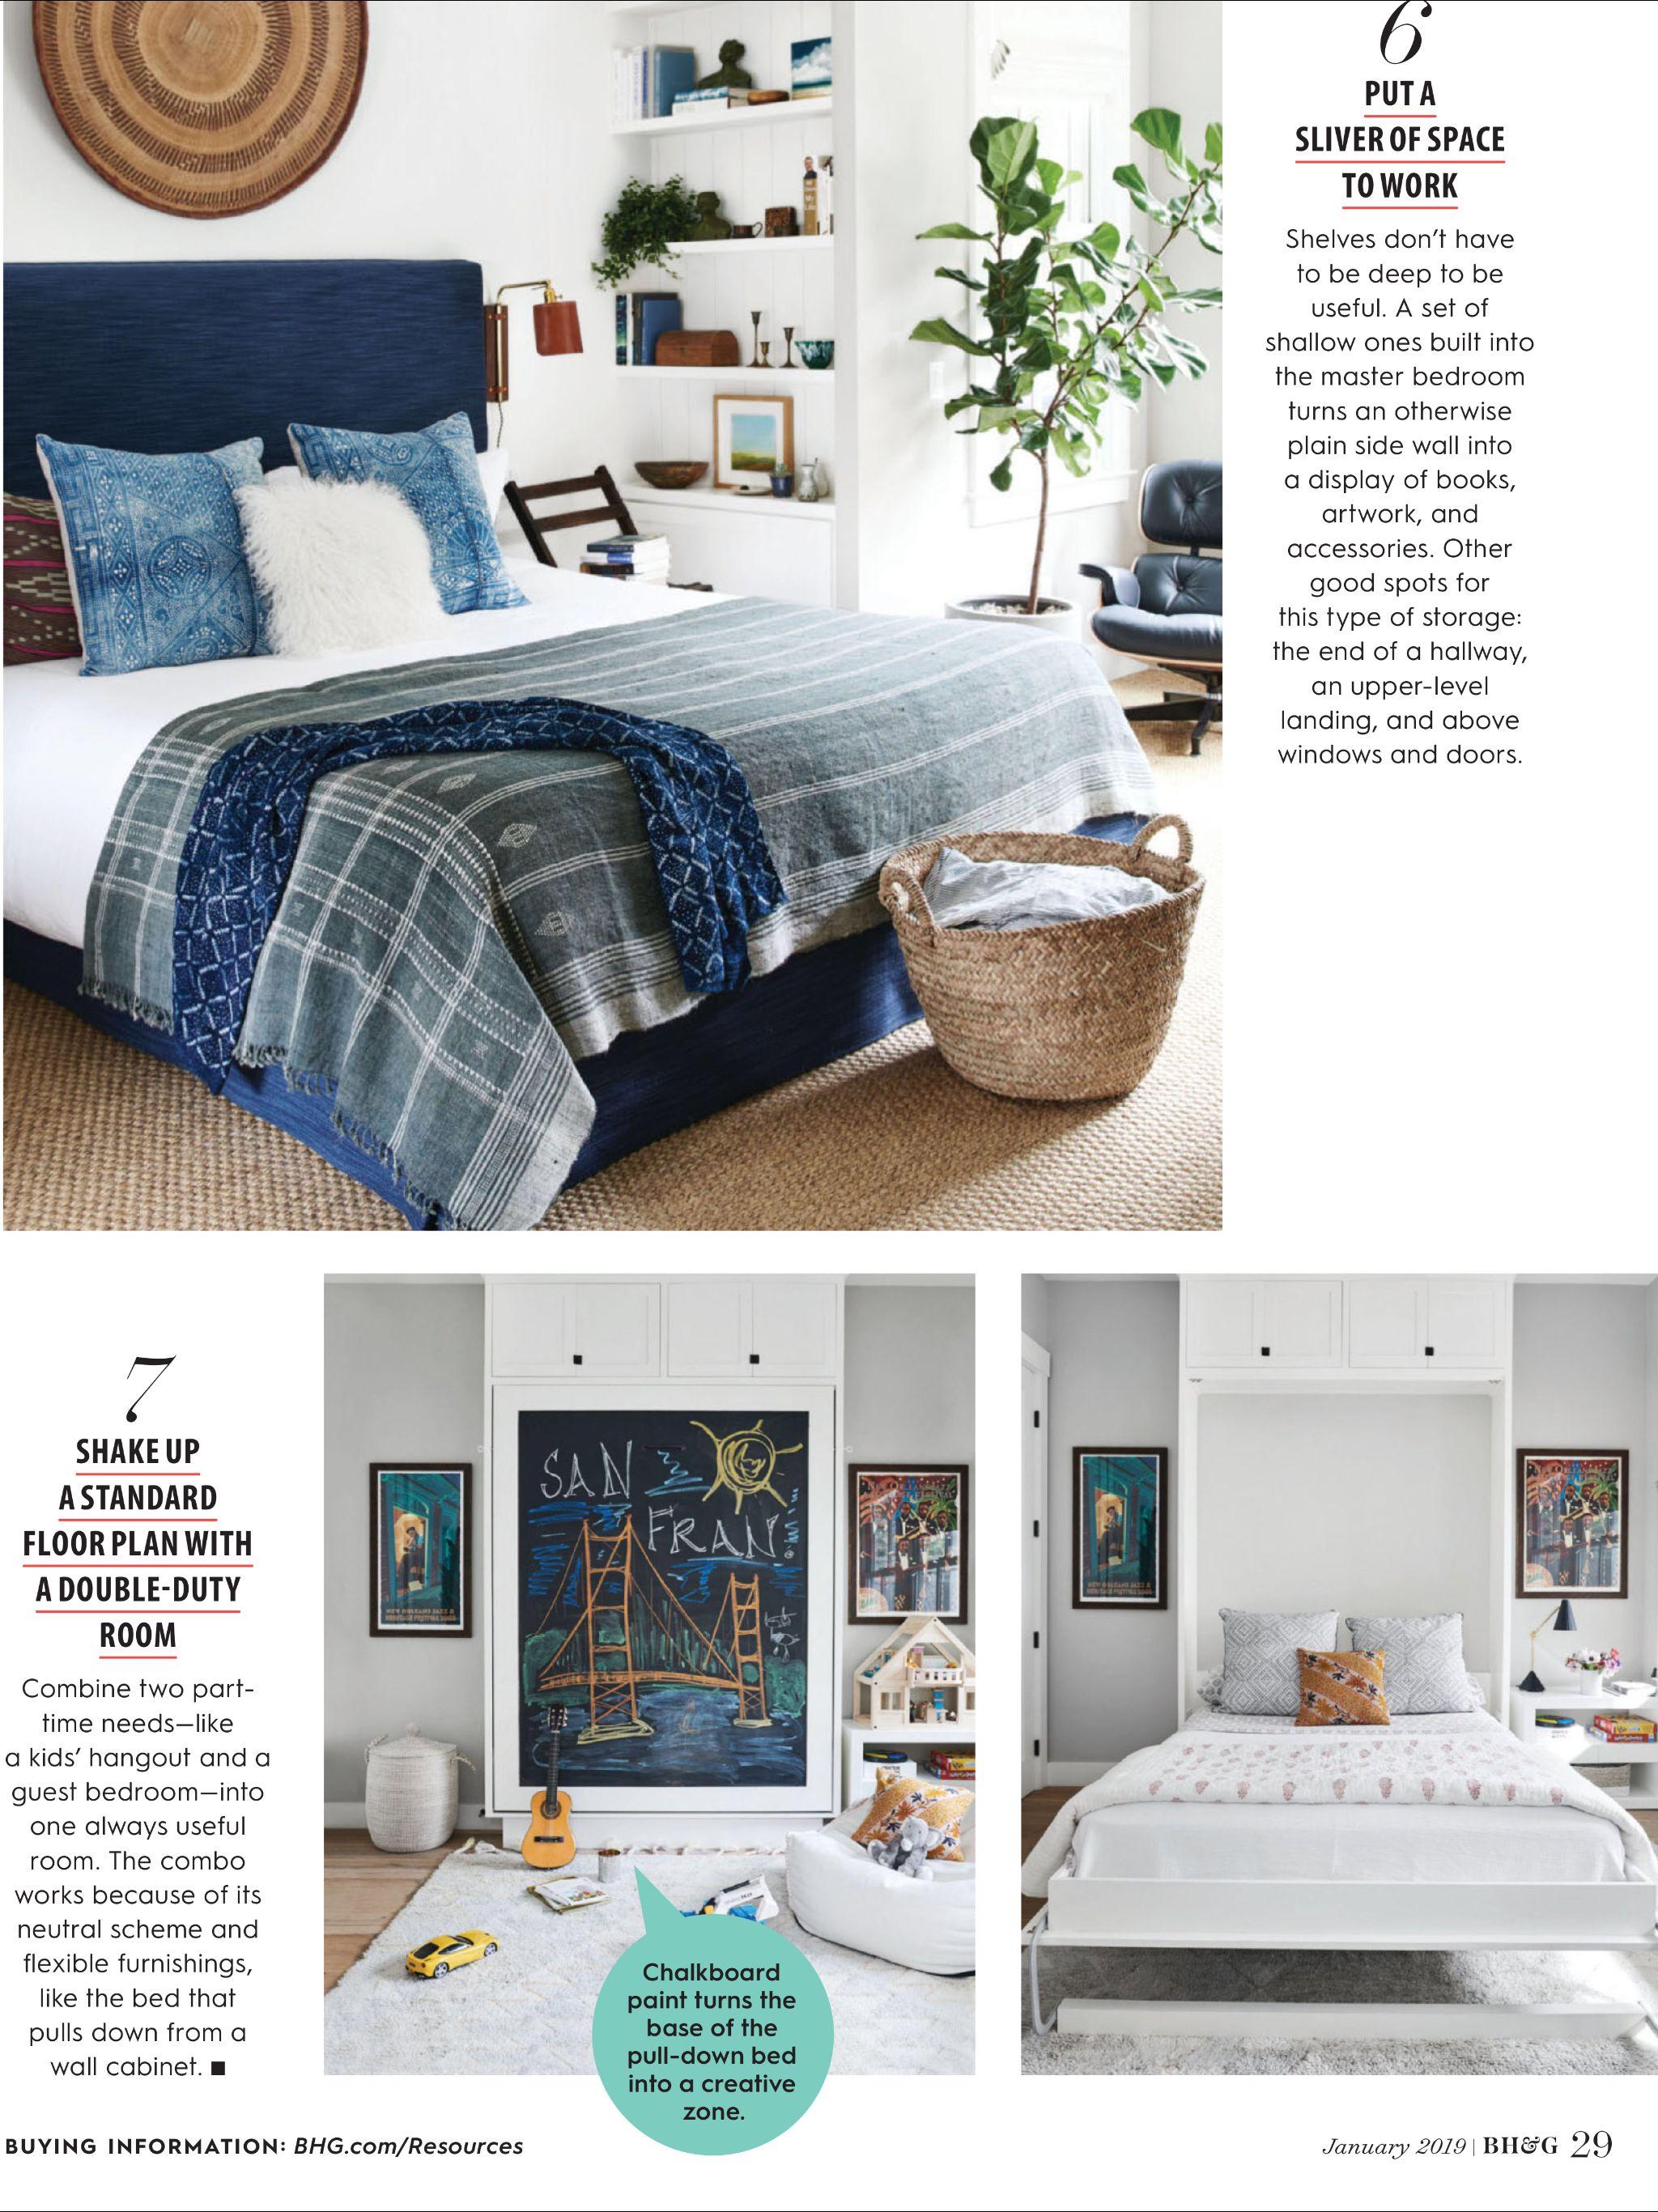 336017c315a3f2855249293f69f2e9ea - January 2019 Better Homes And Gardens Magazine